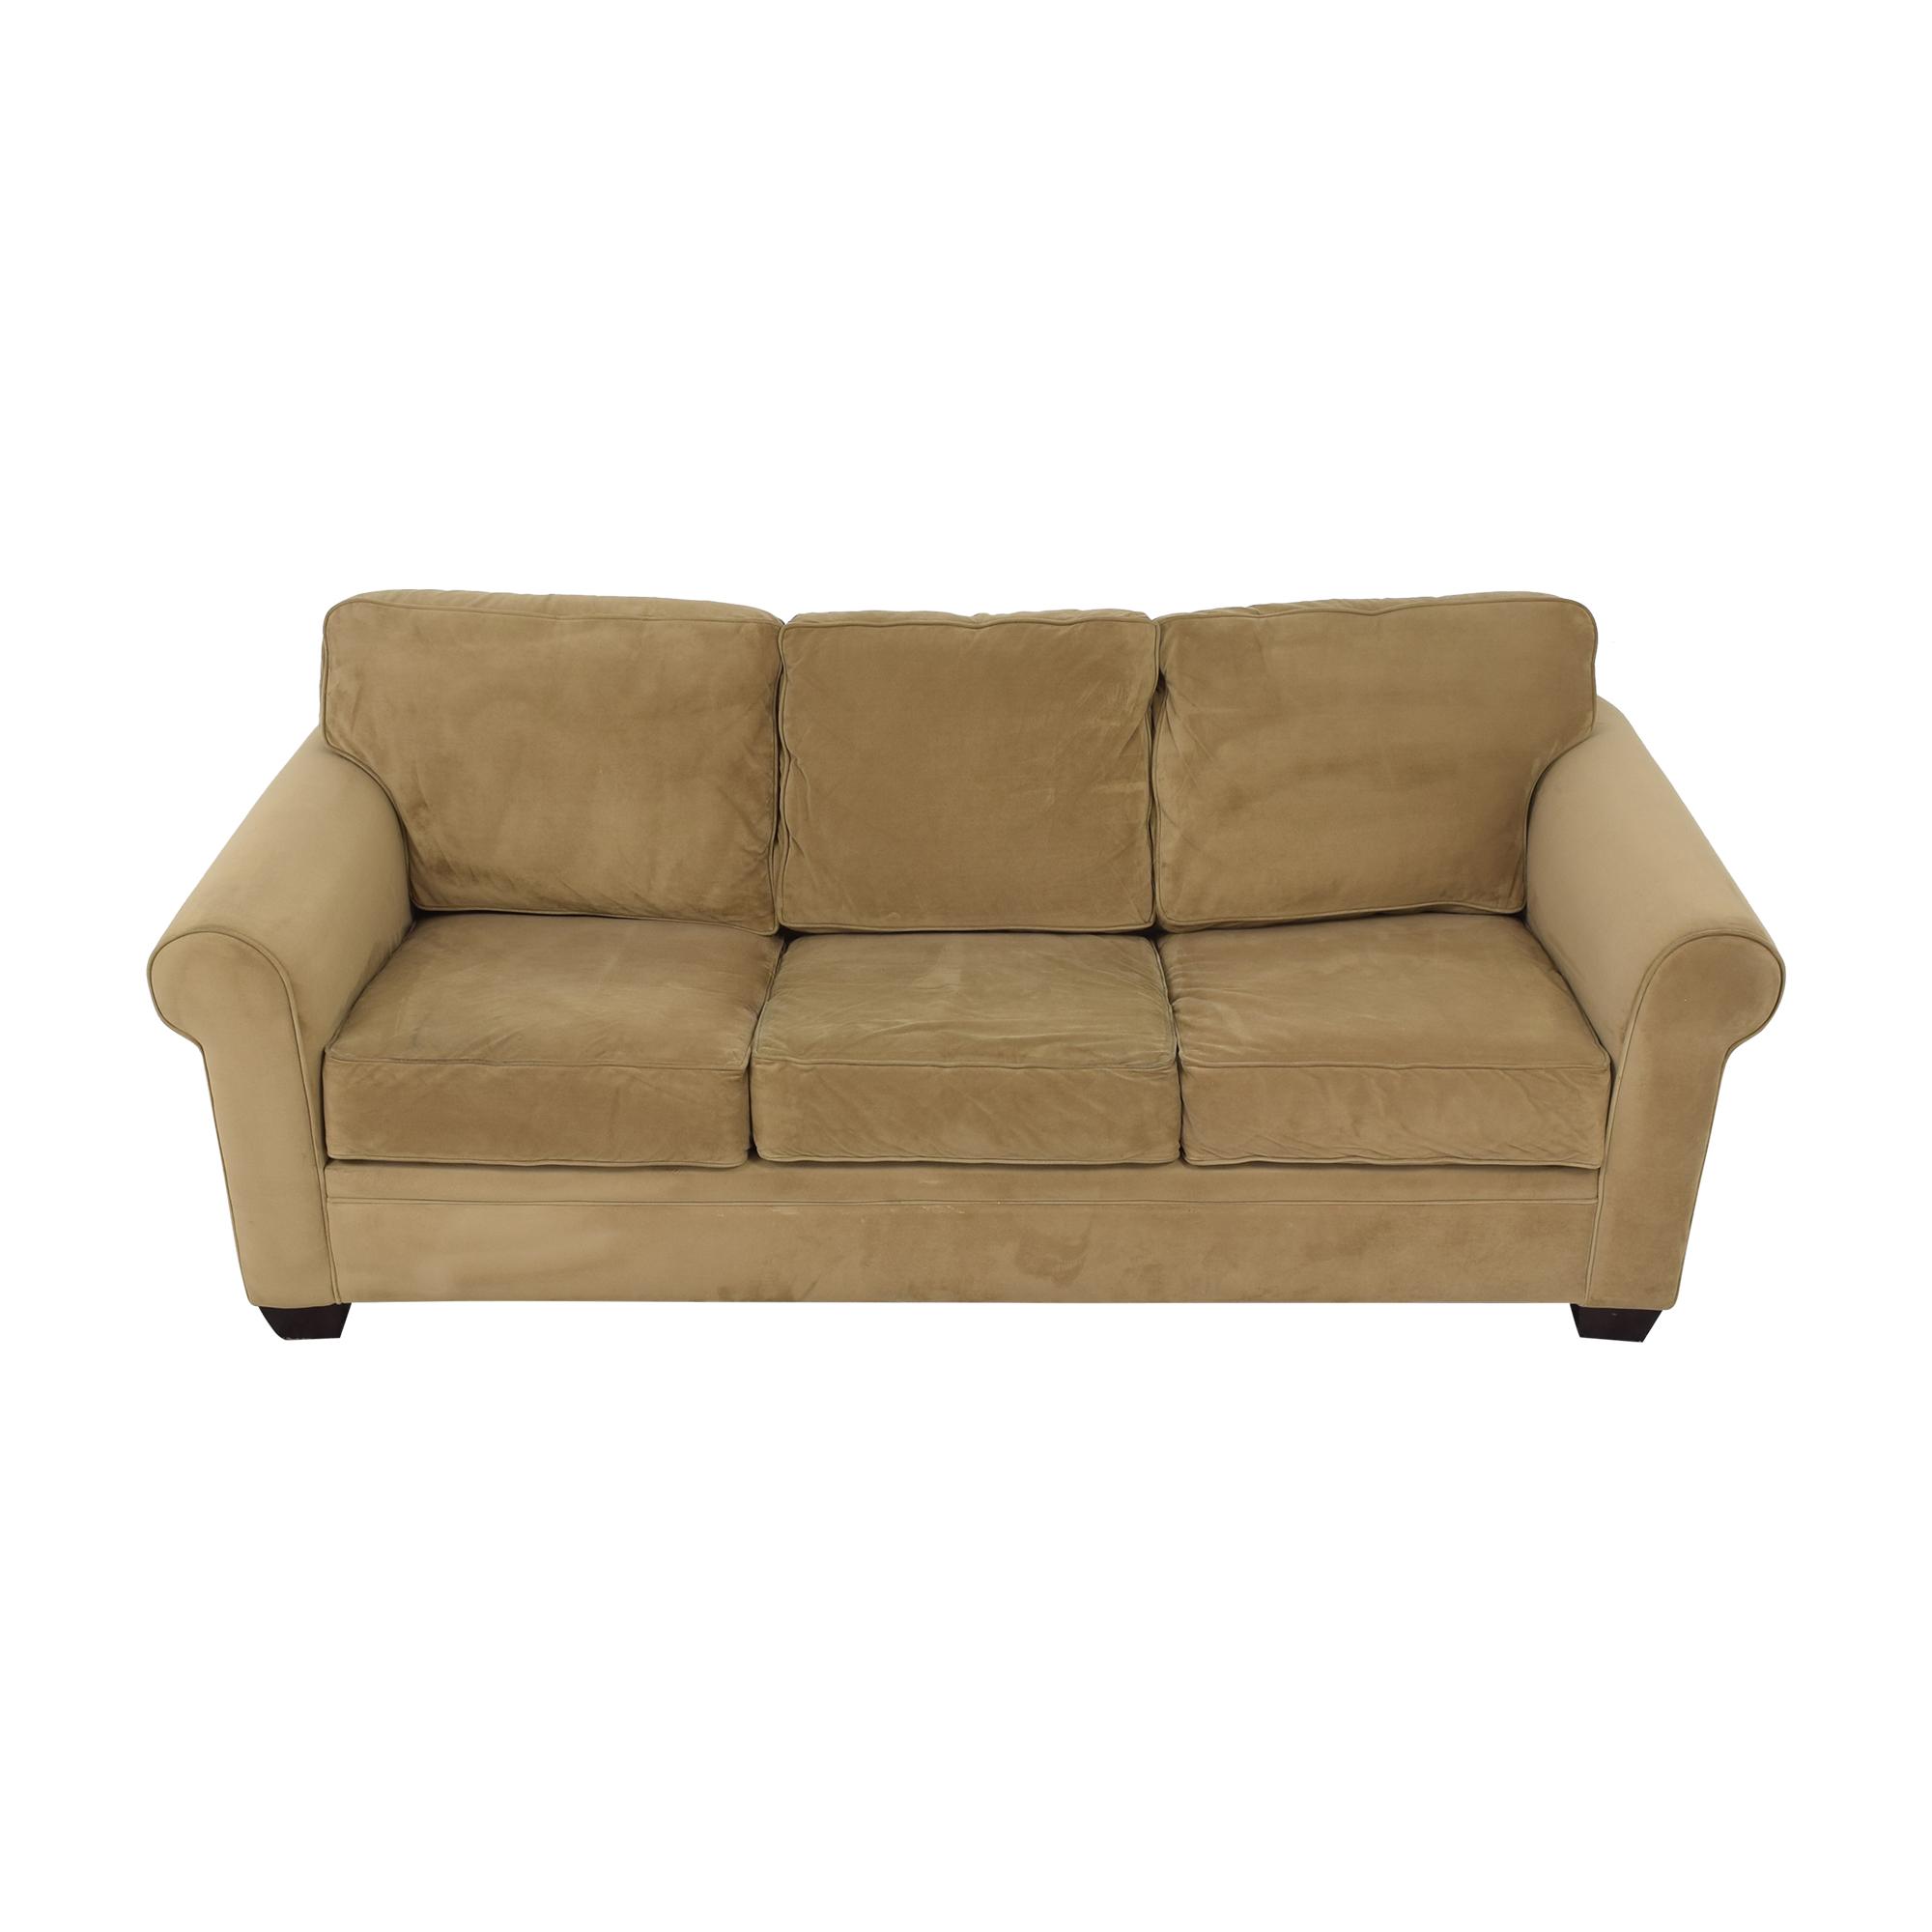 Macy's Macy's Tan Sofa Bed ma